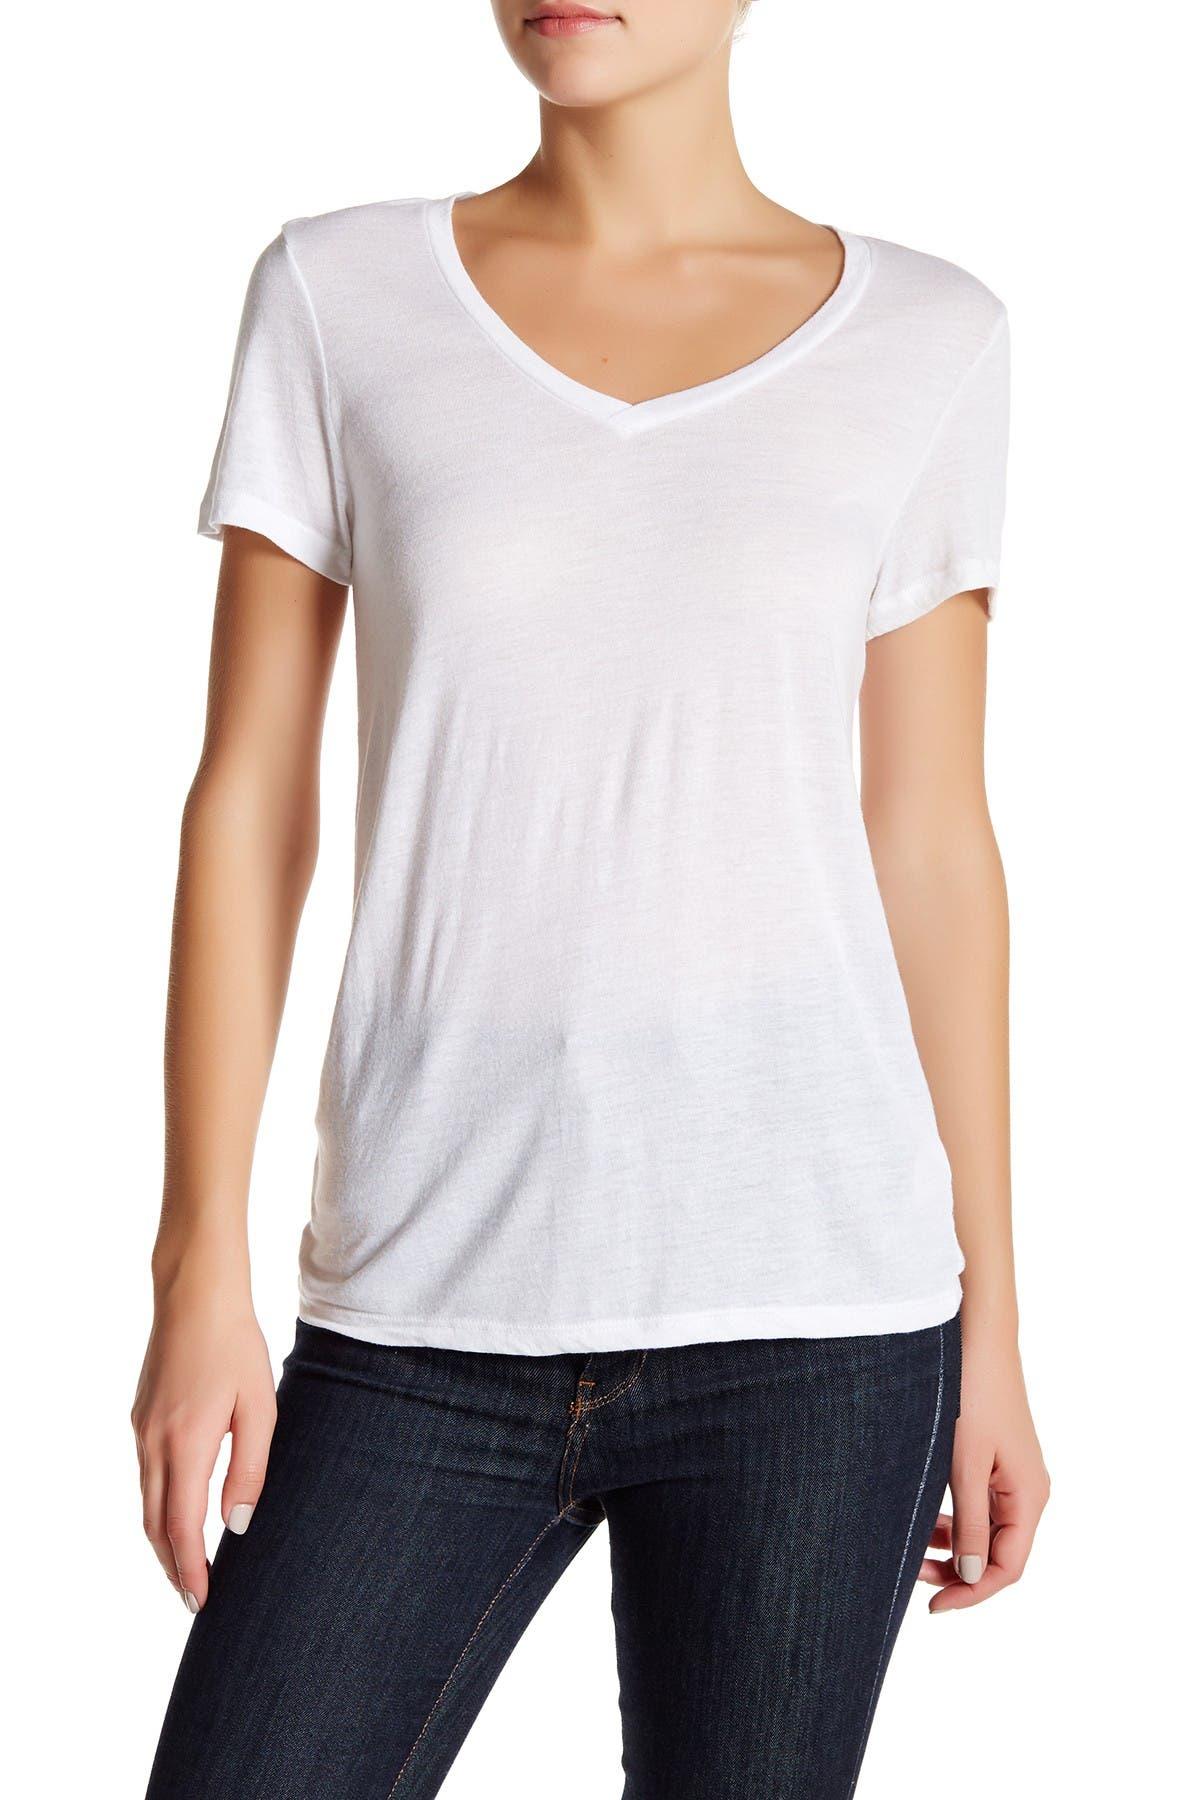 Image of Abound Short Sleeve V-Neck T-Shirt